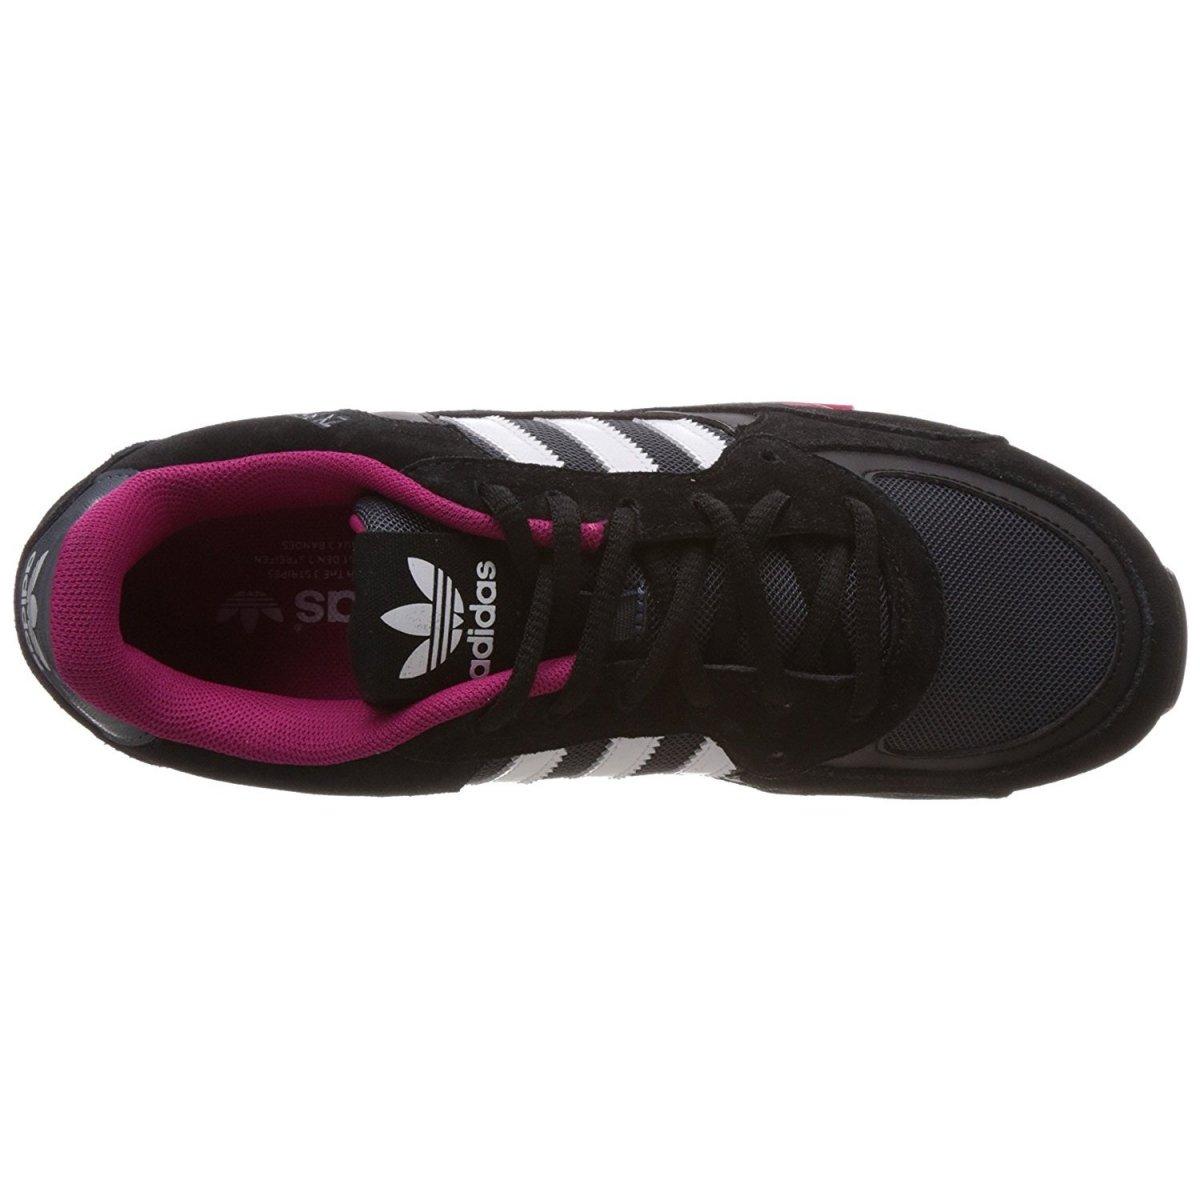 adidas ZX 850 Shoes | adidas Australia | Kid shoes | Adidas